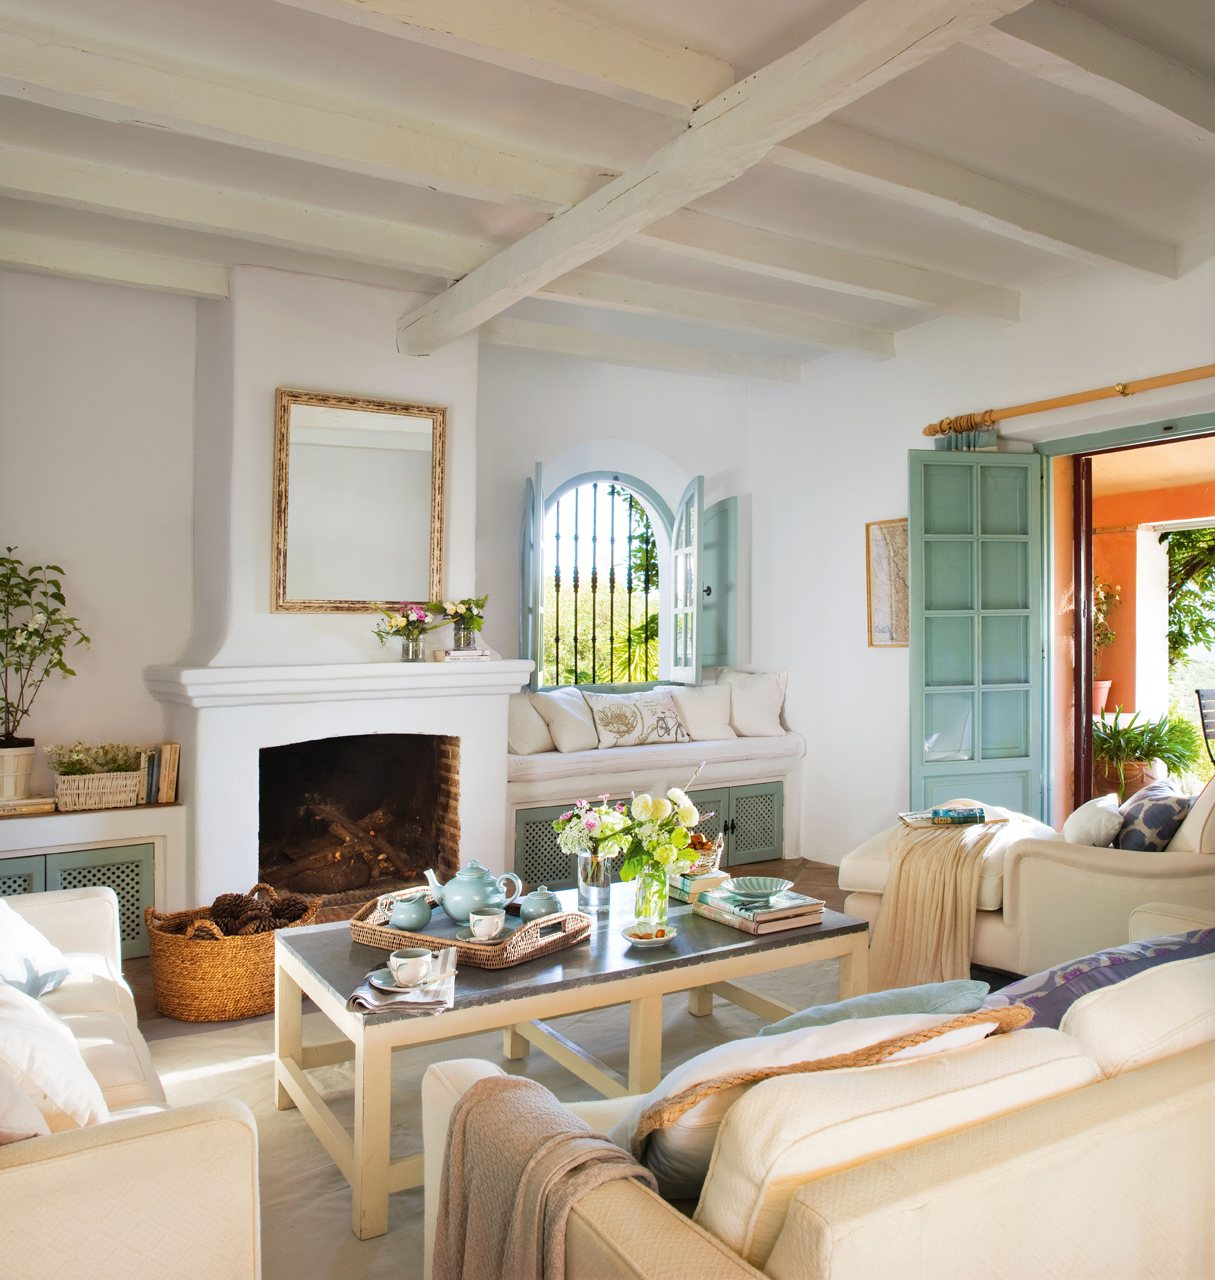 15 salones con chimenea para el invierno - Chimenea de pared ...